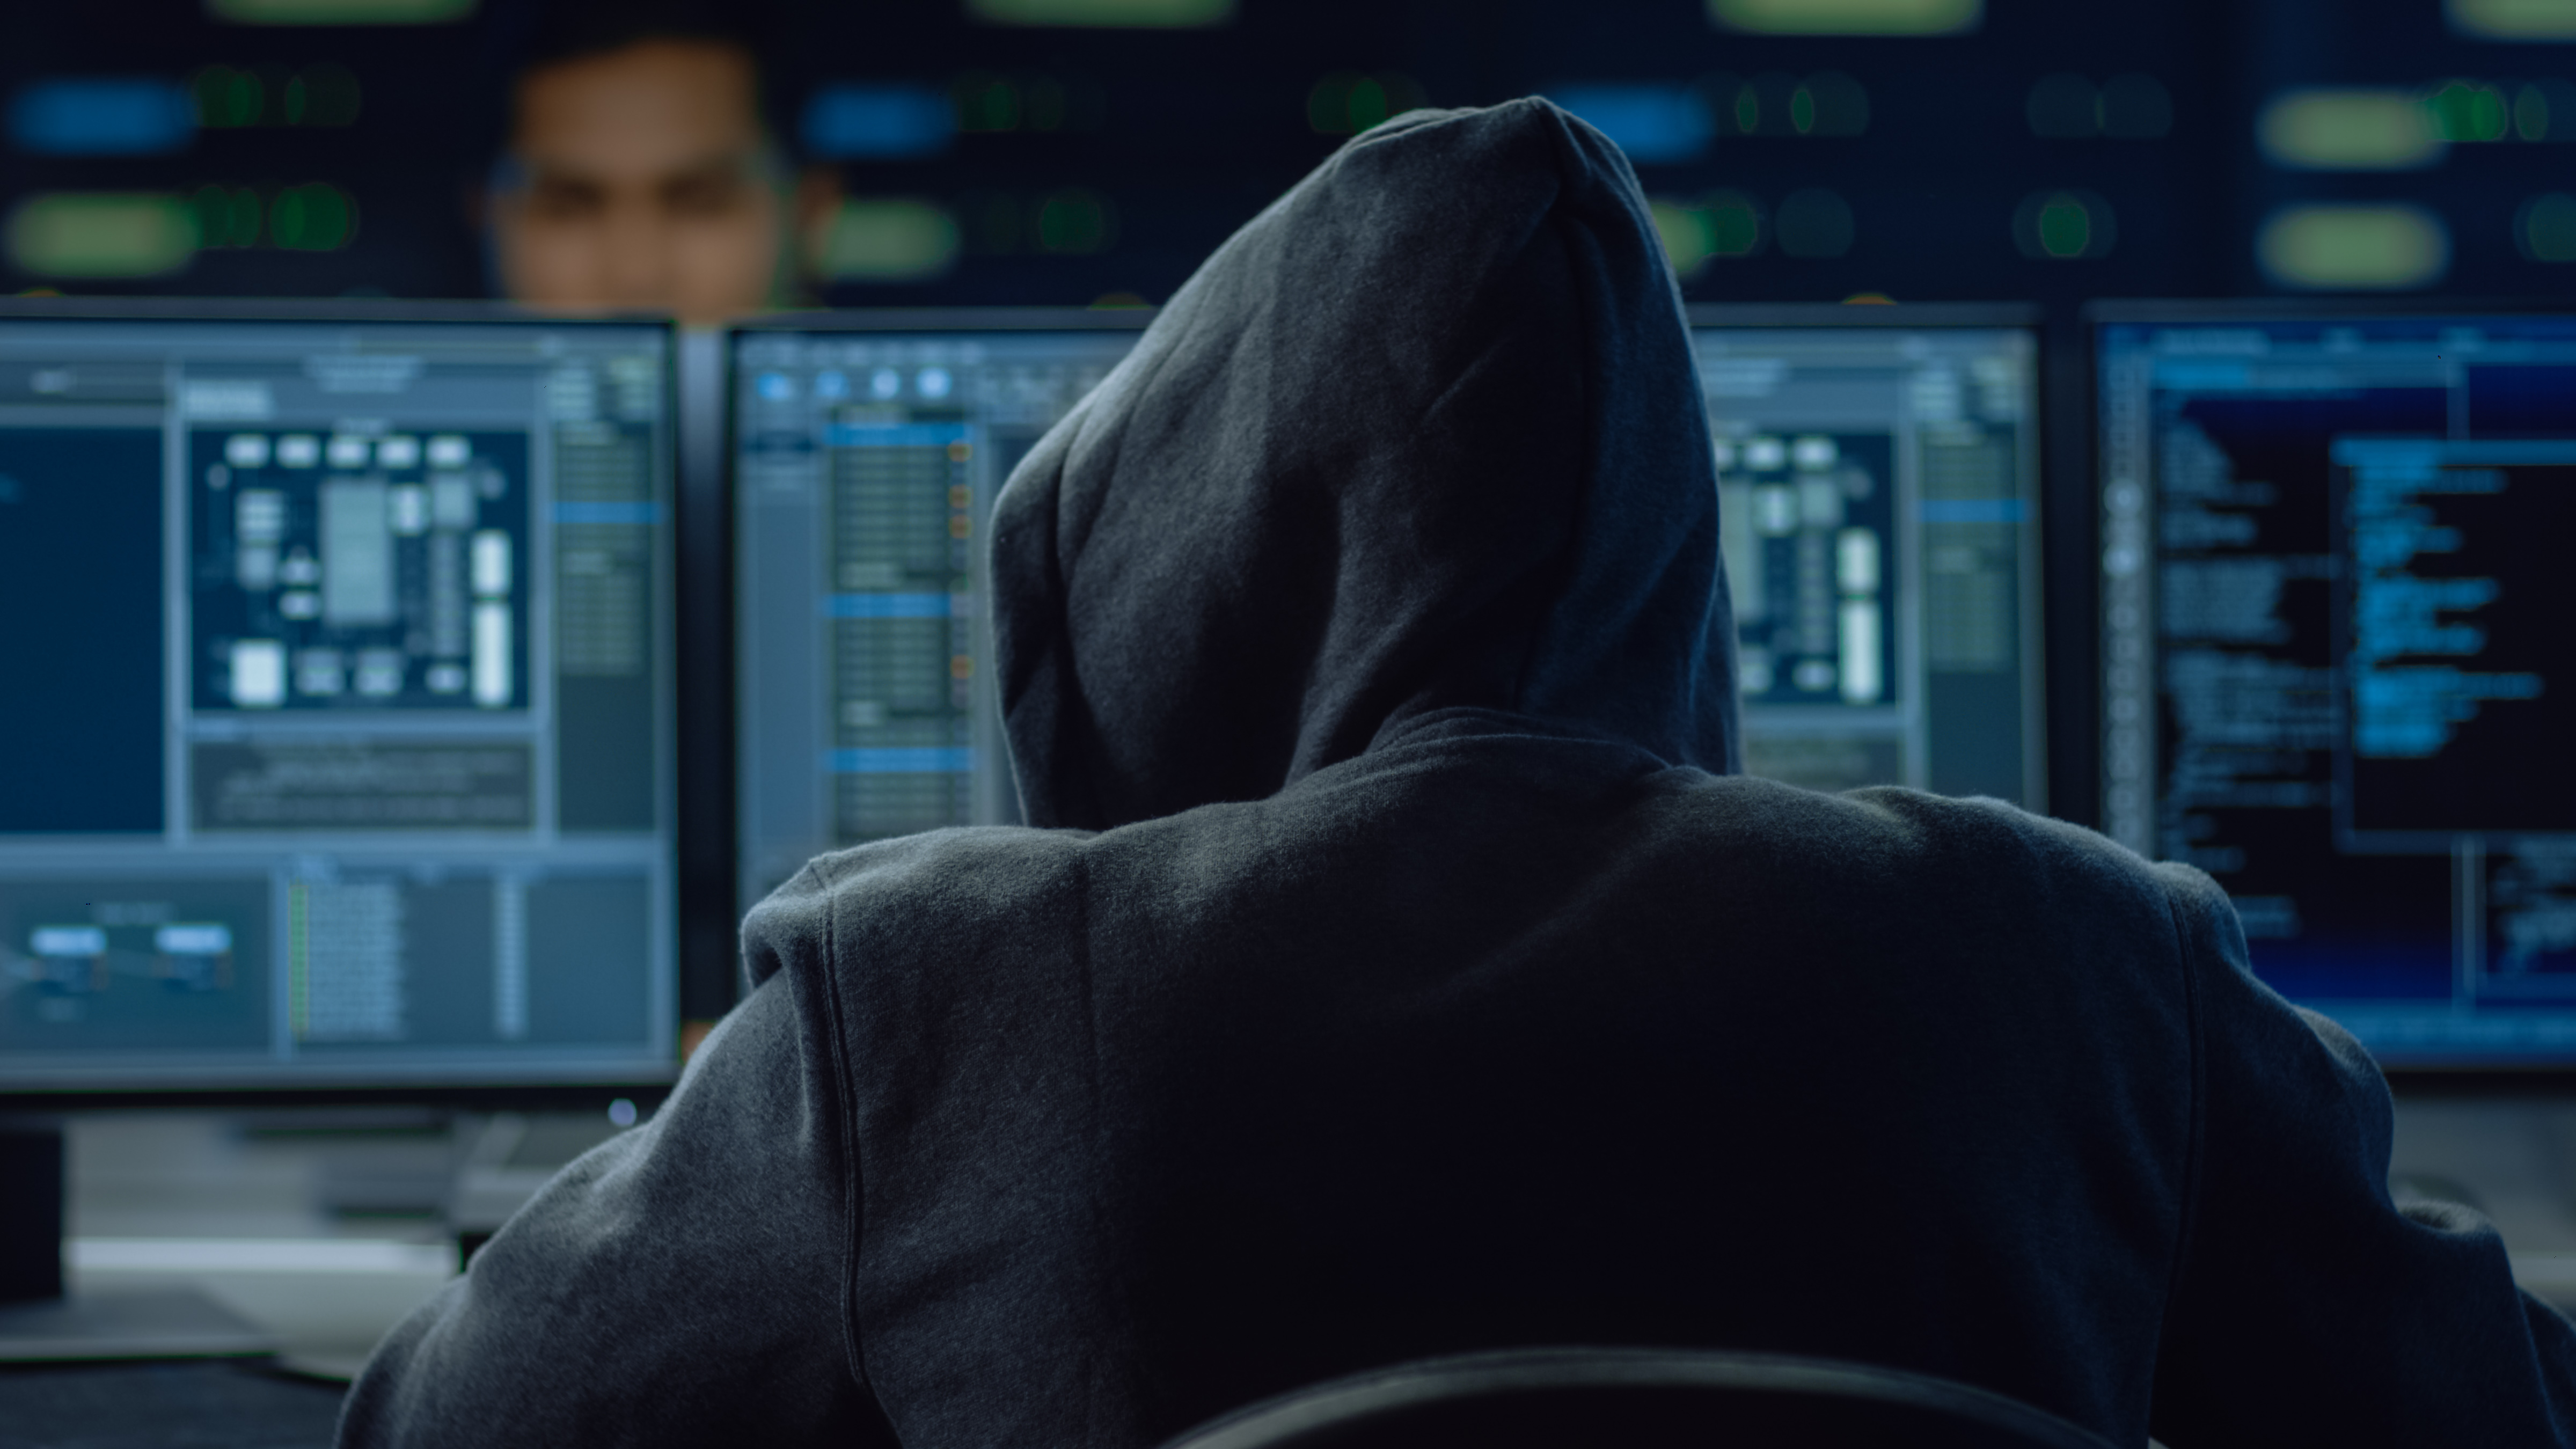 Cloud hosting and DDoS attacks